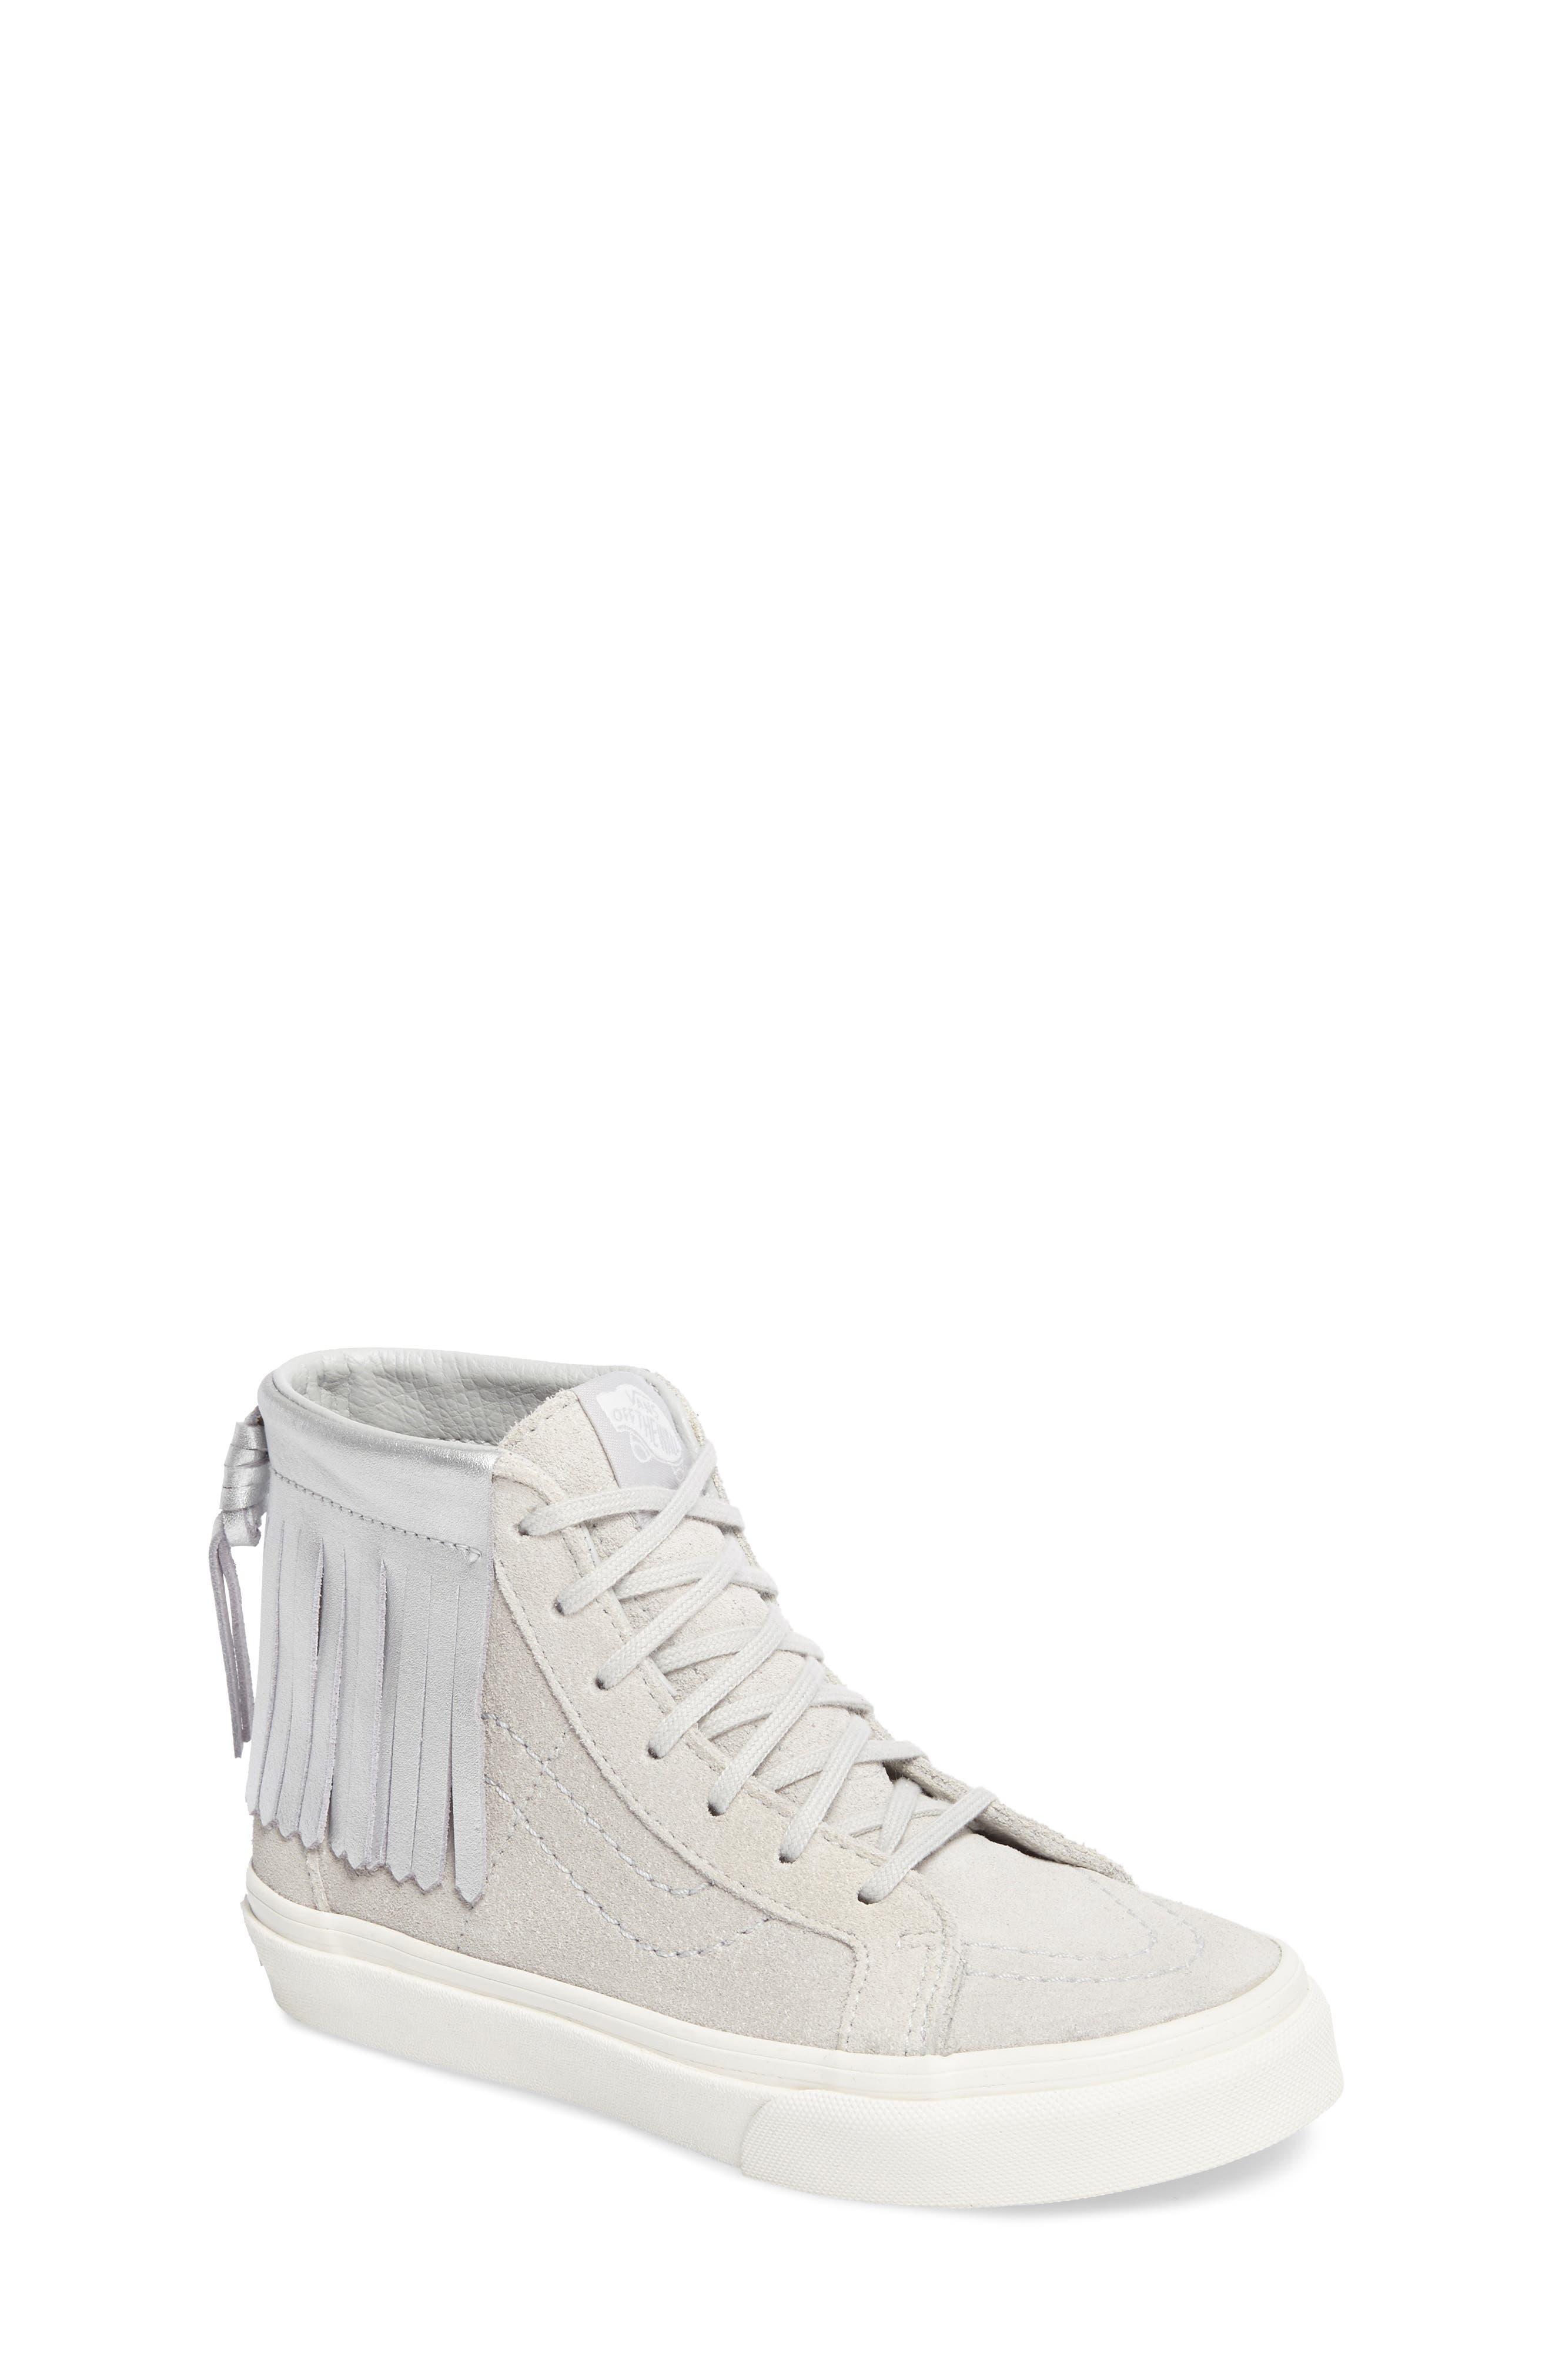 Sk8-Hi Moc Sneaker,                             Main thumbnail 1, color,                             Metallic Glacier Gray